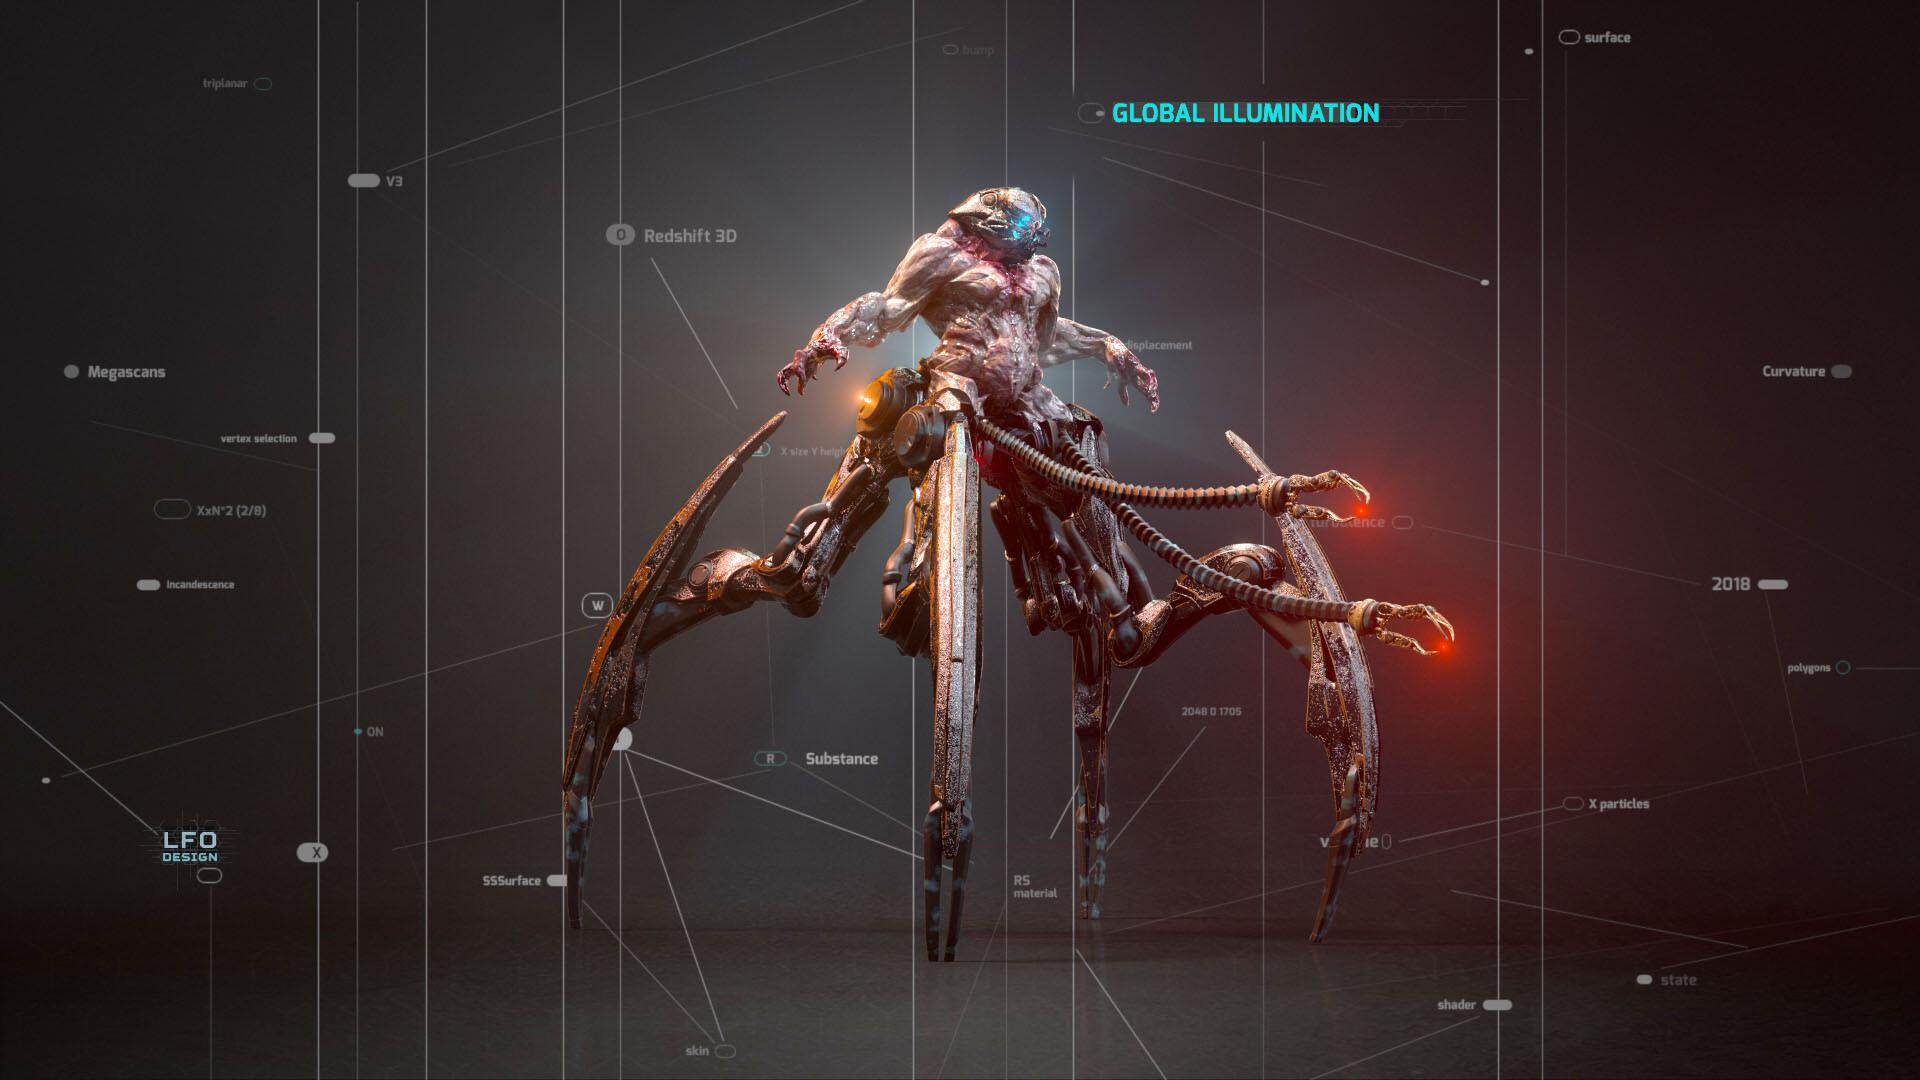 ArtStation - 3D Rendering for VFX and Games – Online Course